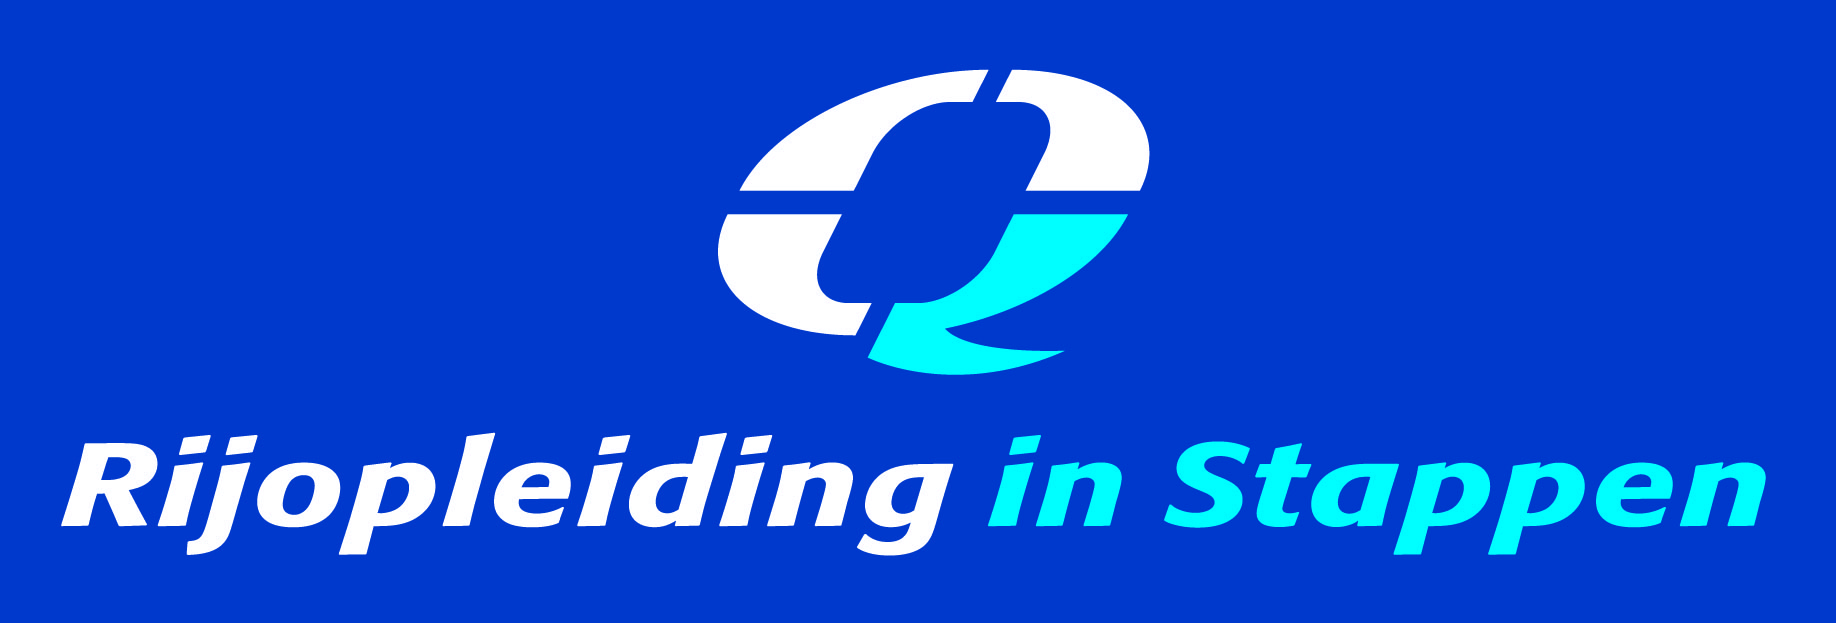 Rijopleiding In Stappen (RIS)